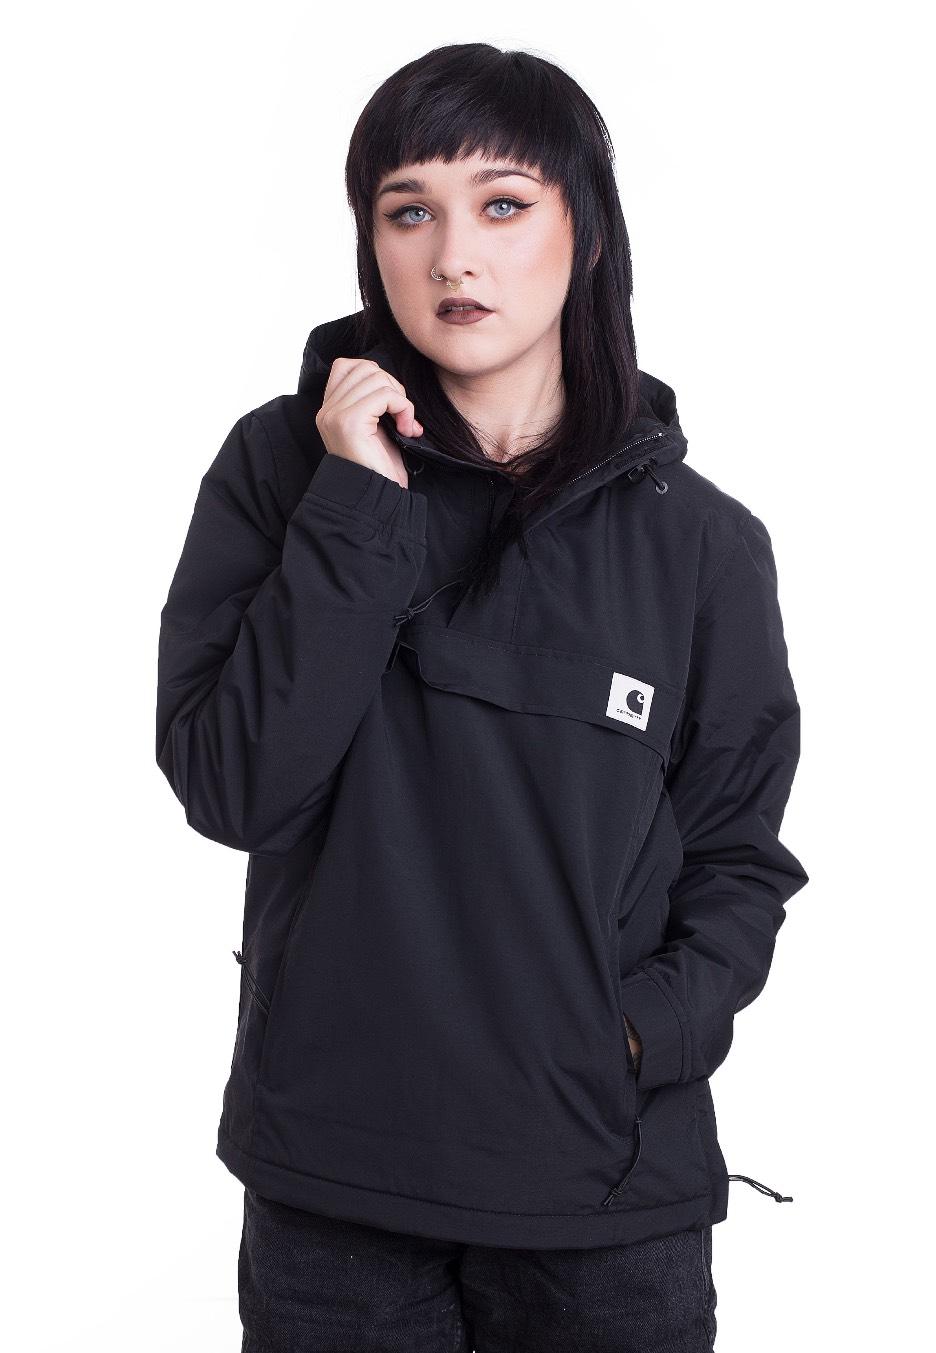 Jacken - Carhartt WIP W' Nimbus Pullover Black Winter Jacken  - Onlineshop IMPERICON